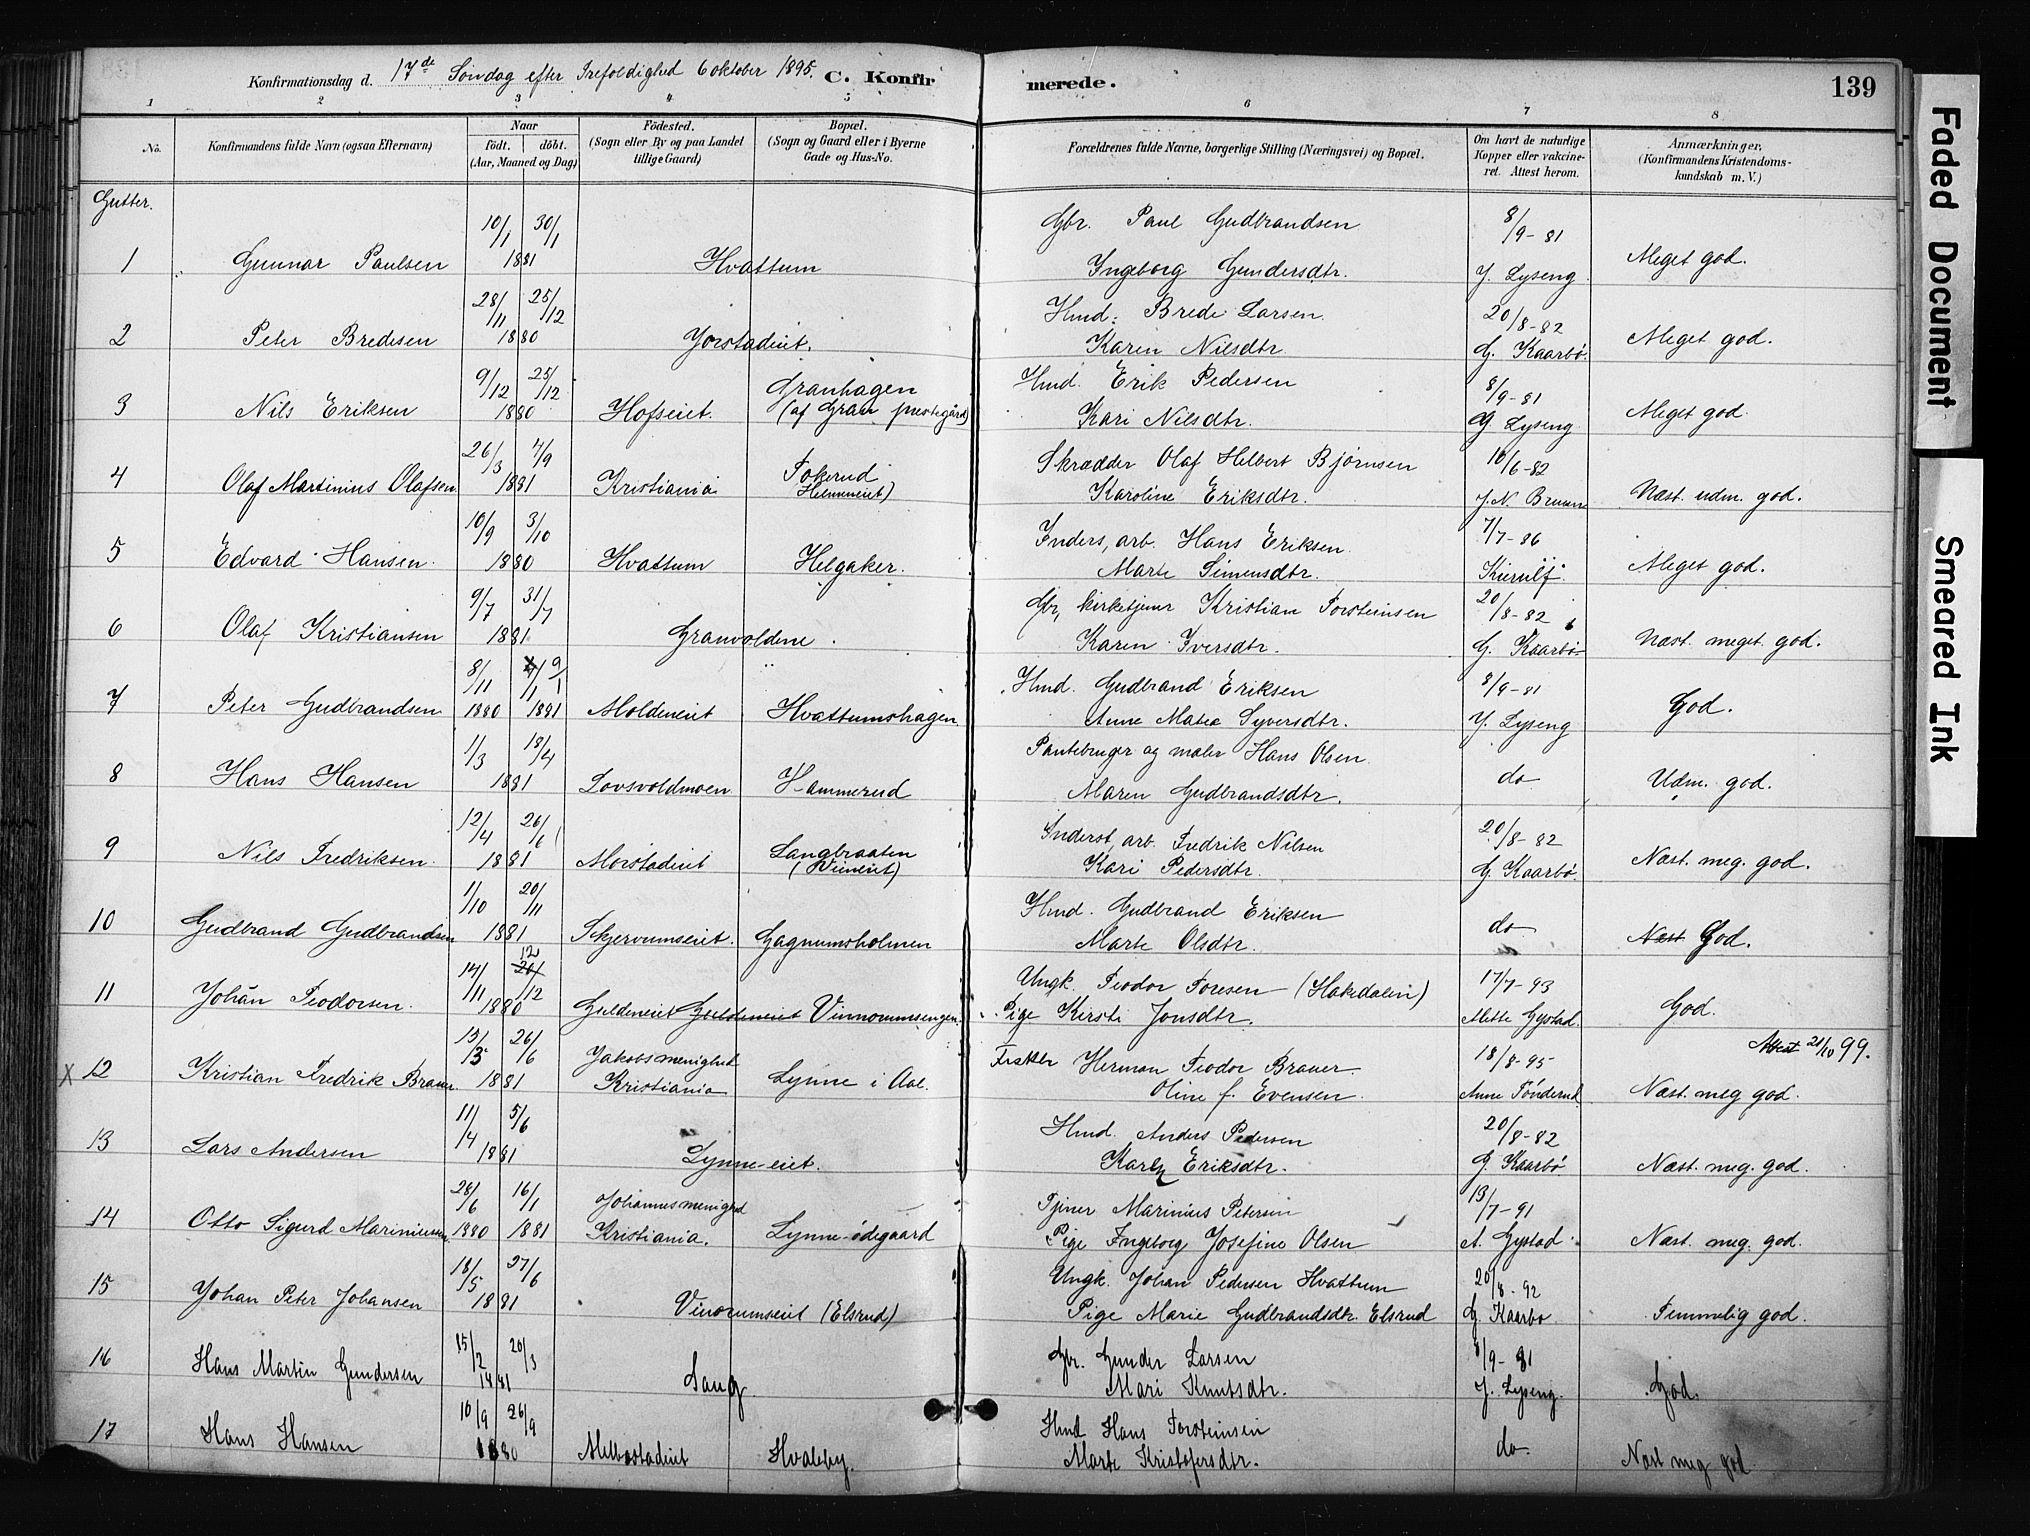 SAH, Gran prestekontor, Ministerialbok nr. 17, 1889-1897, s. 139